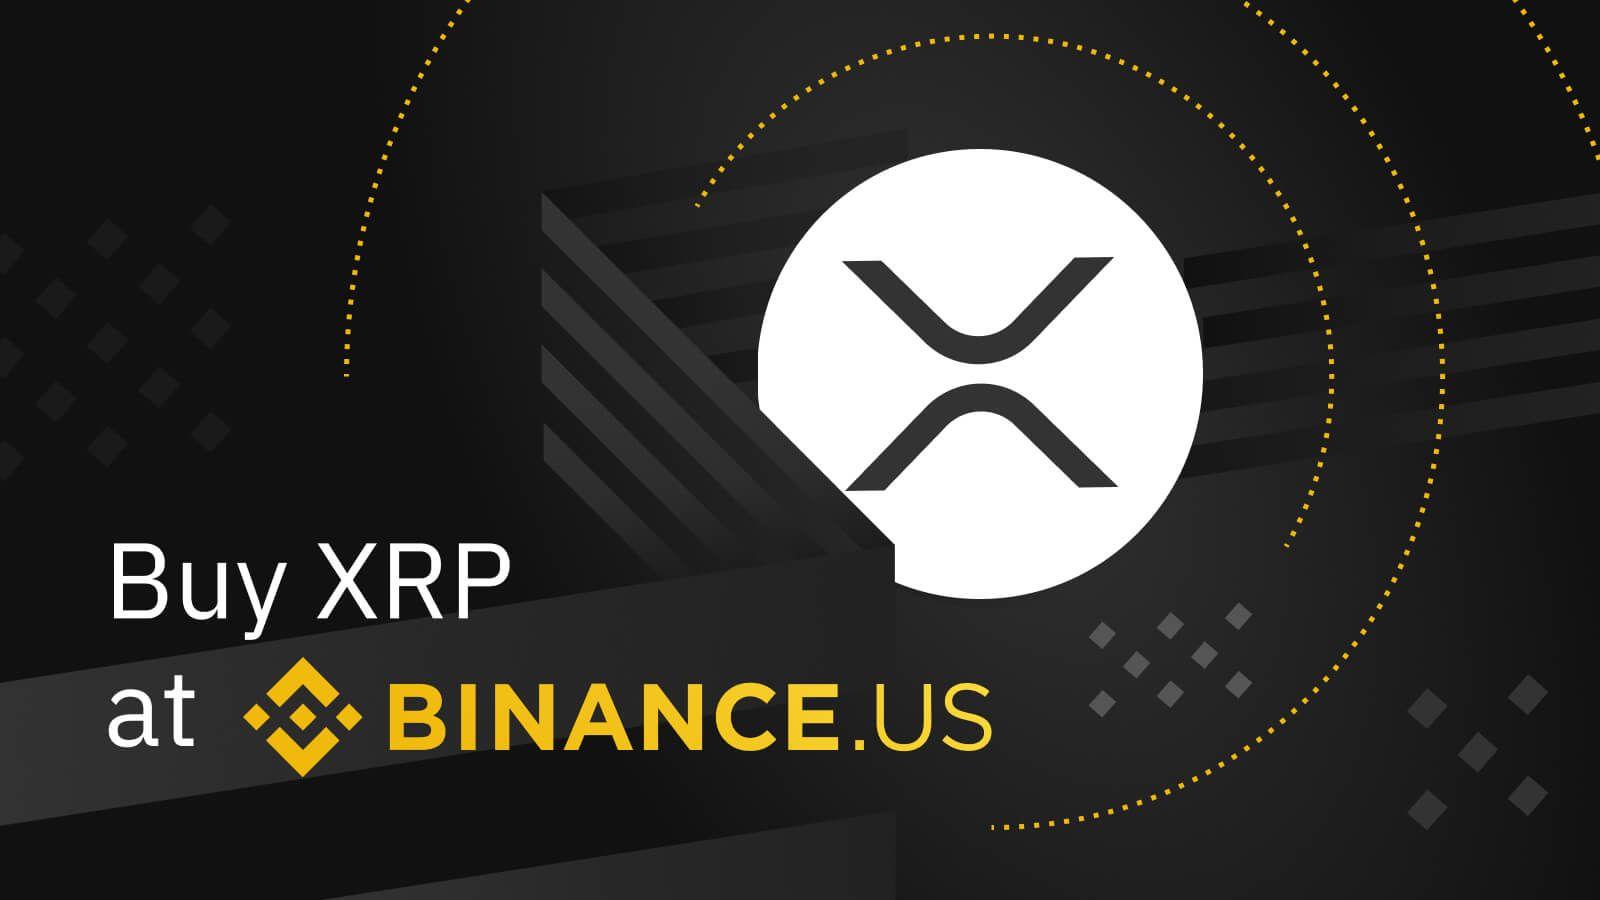 Binance US XRP - Binance.US App Adds XRP/USD Pair - XRP's Liquidity Increases